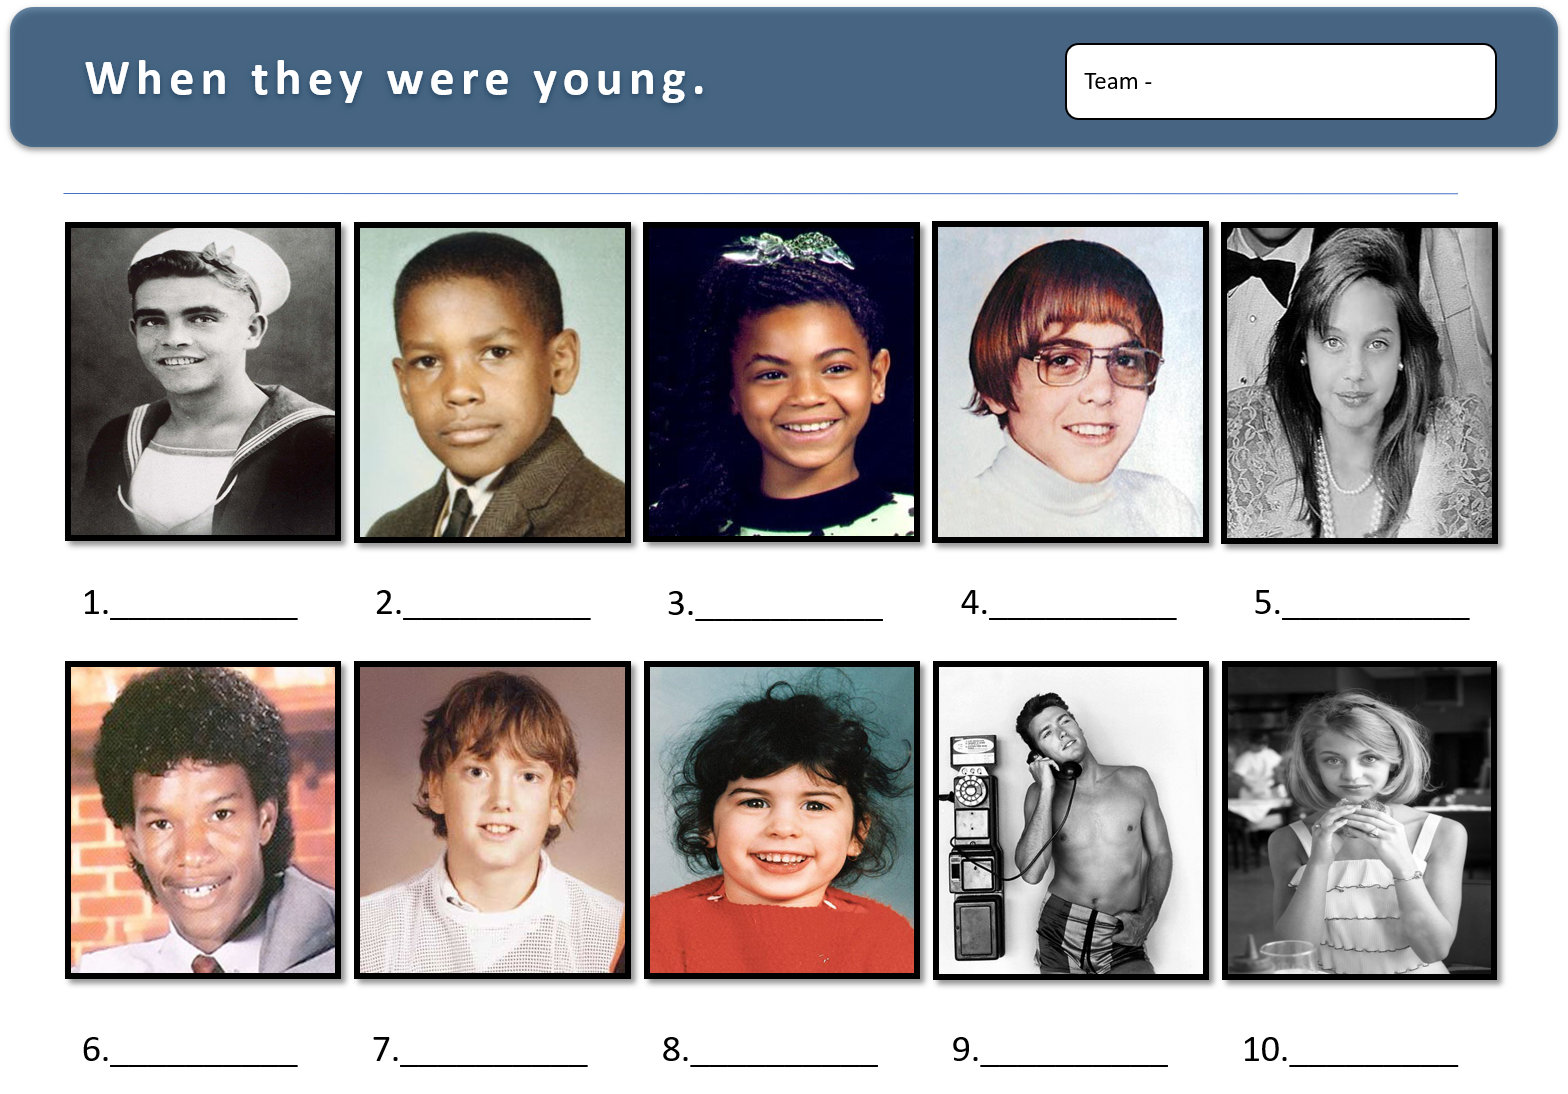 Celebrities as children trivia quiz picture round Trivia